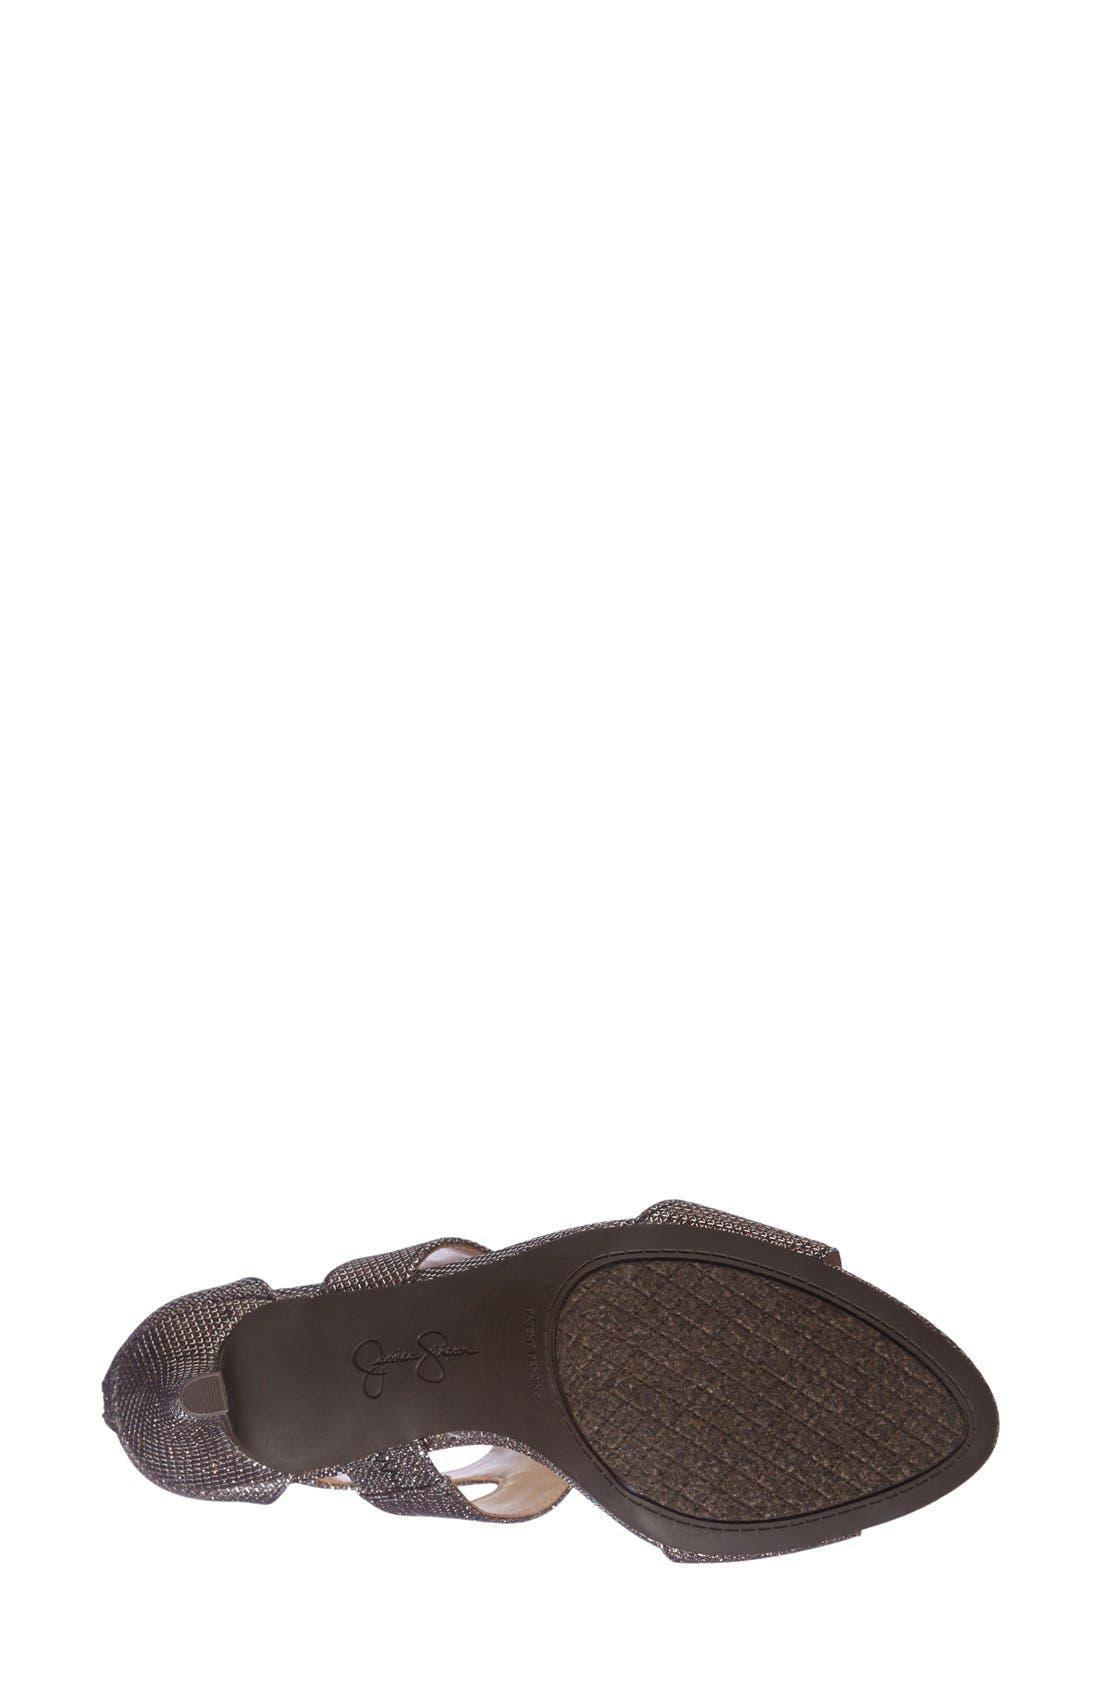 ,                             'Mekos'  Cutout Sandal,                             Alternate thumbnail 28, color,                             240